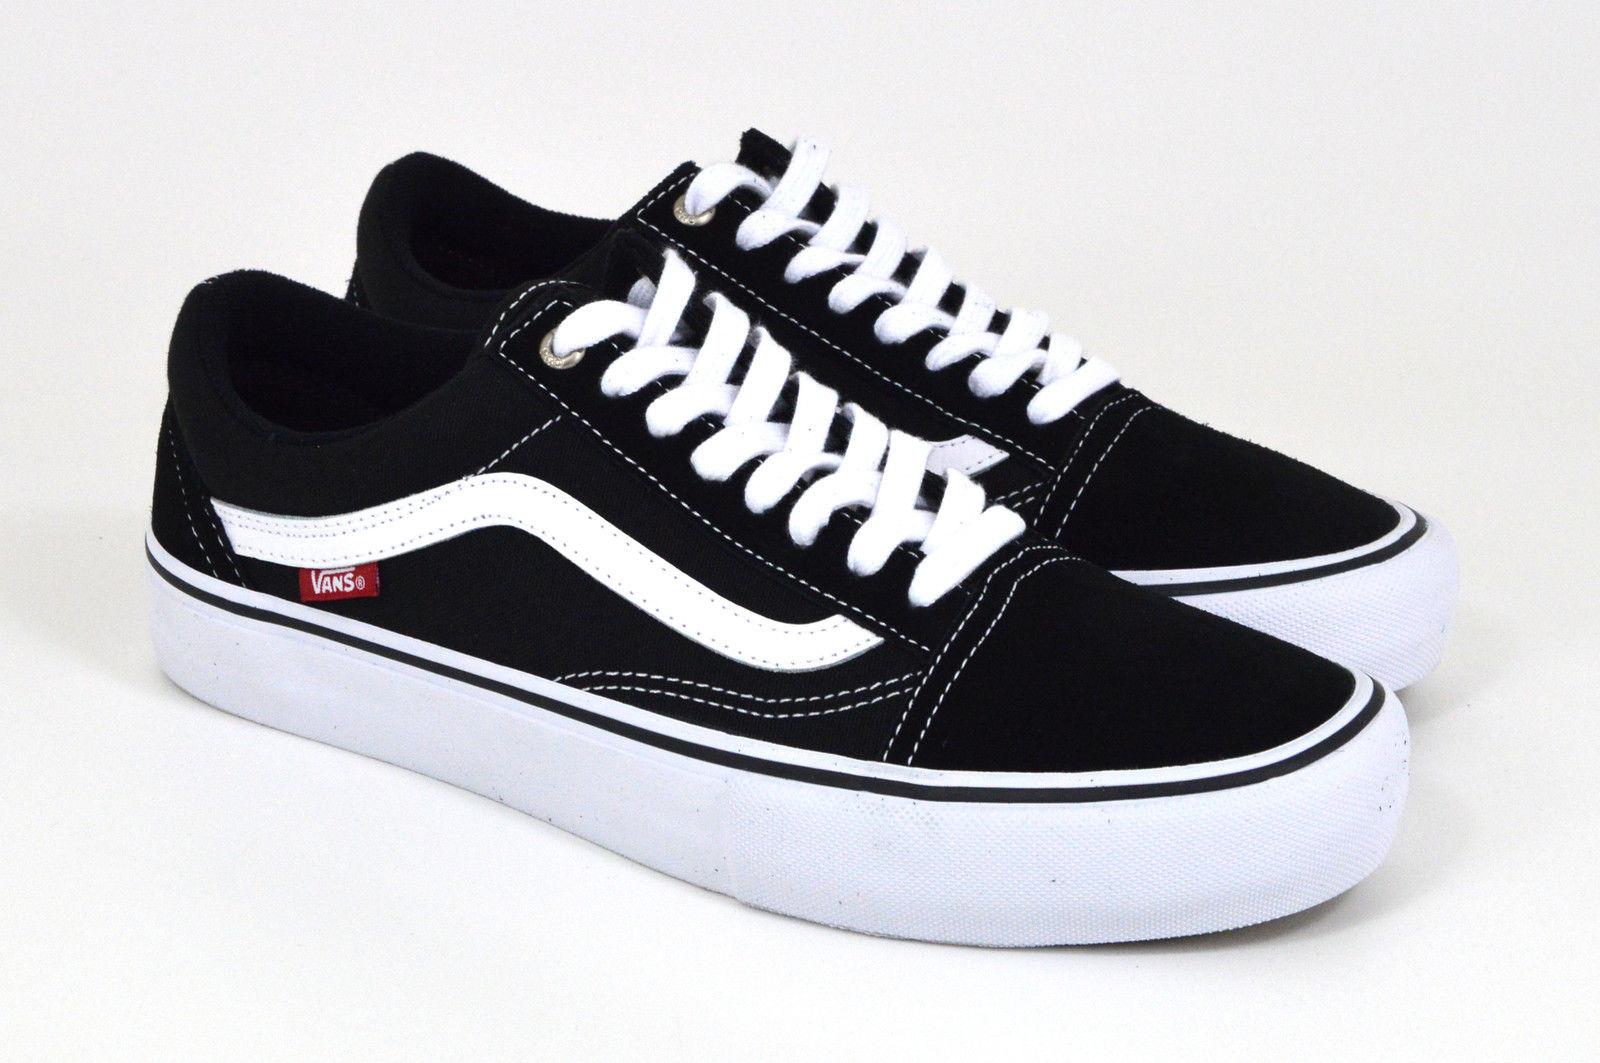 Vans - OLD SKOOL PRO - Black/White